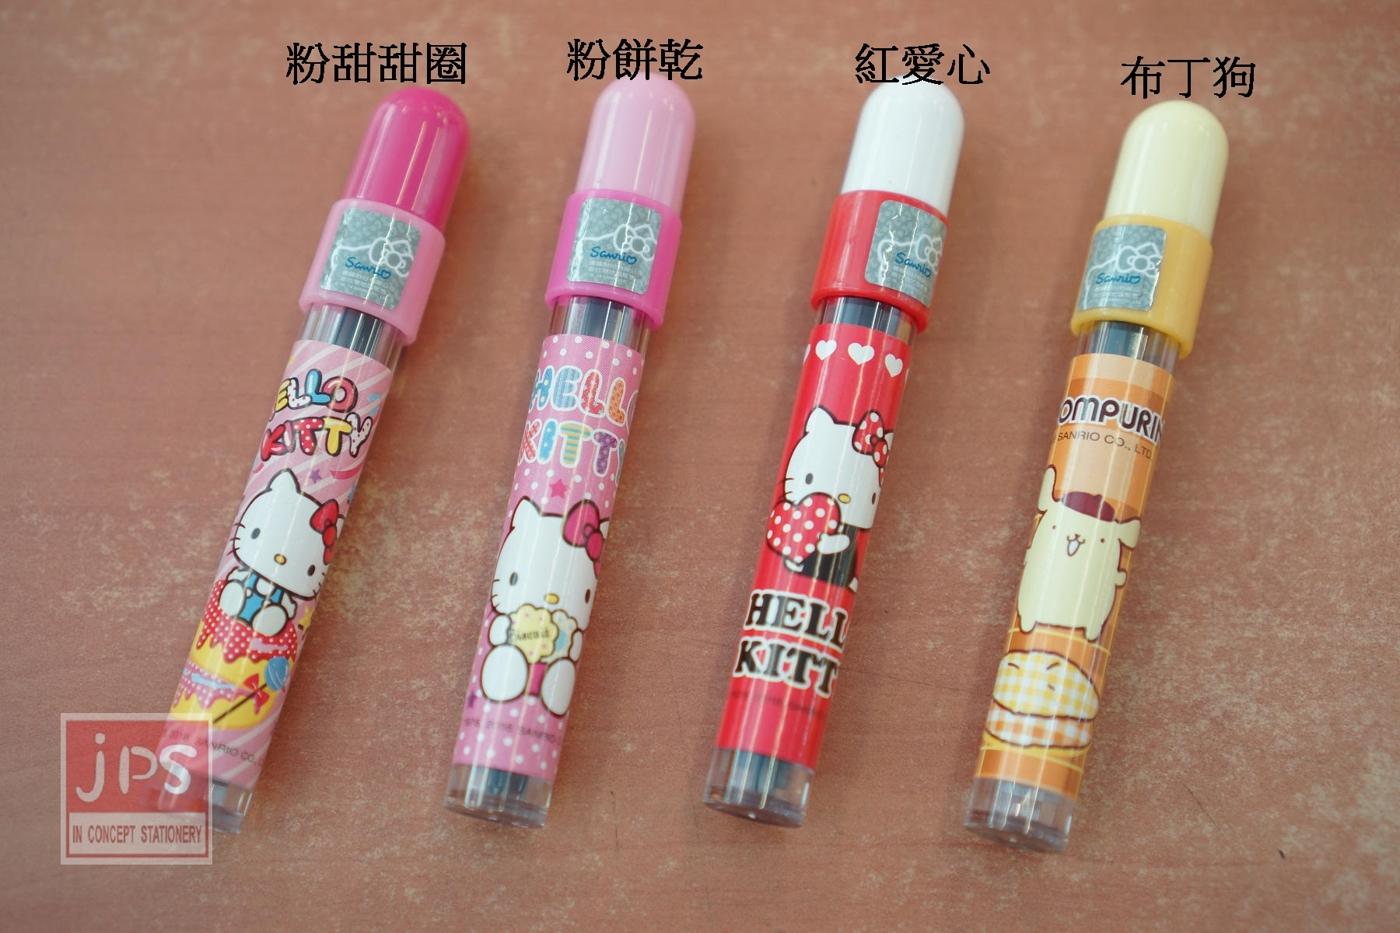 Hello Kitty & 布丁狗 圓筆芯桶 HB (粉甜甜圈&粉餅乾&紅愛心&布丁狗)